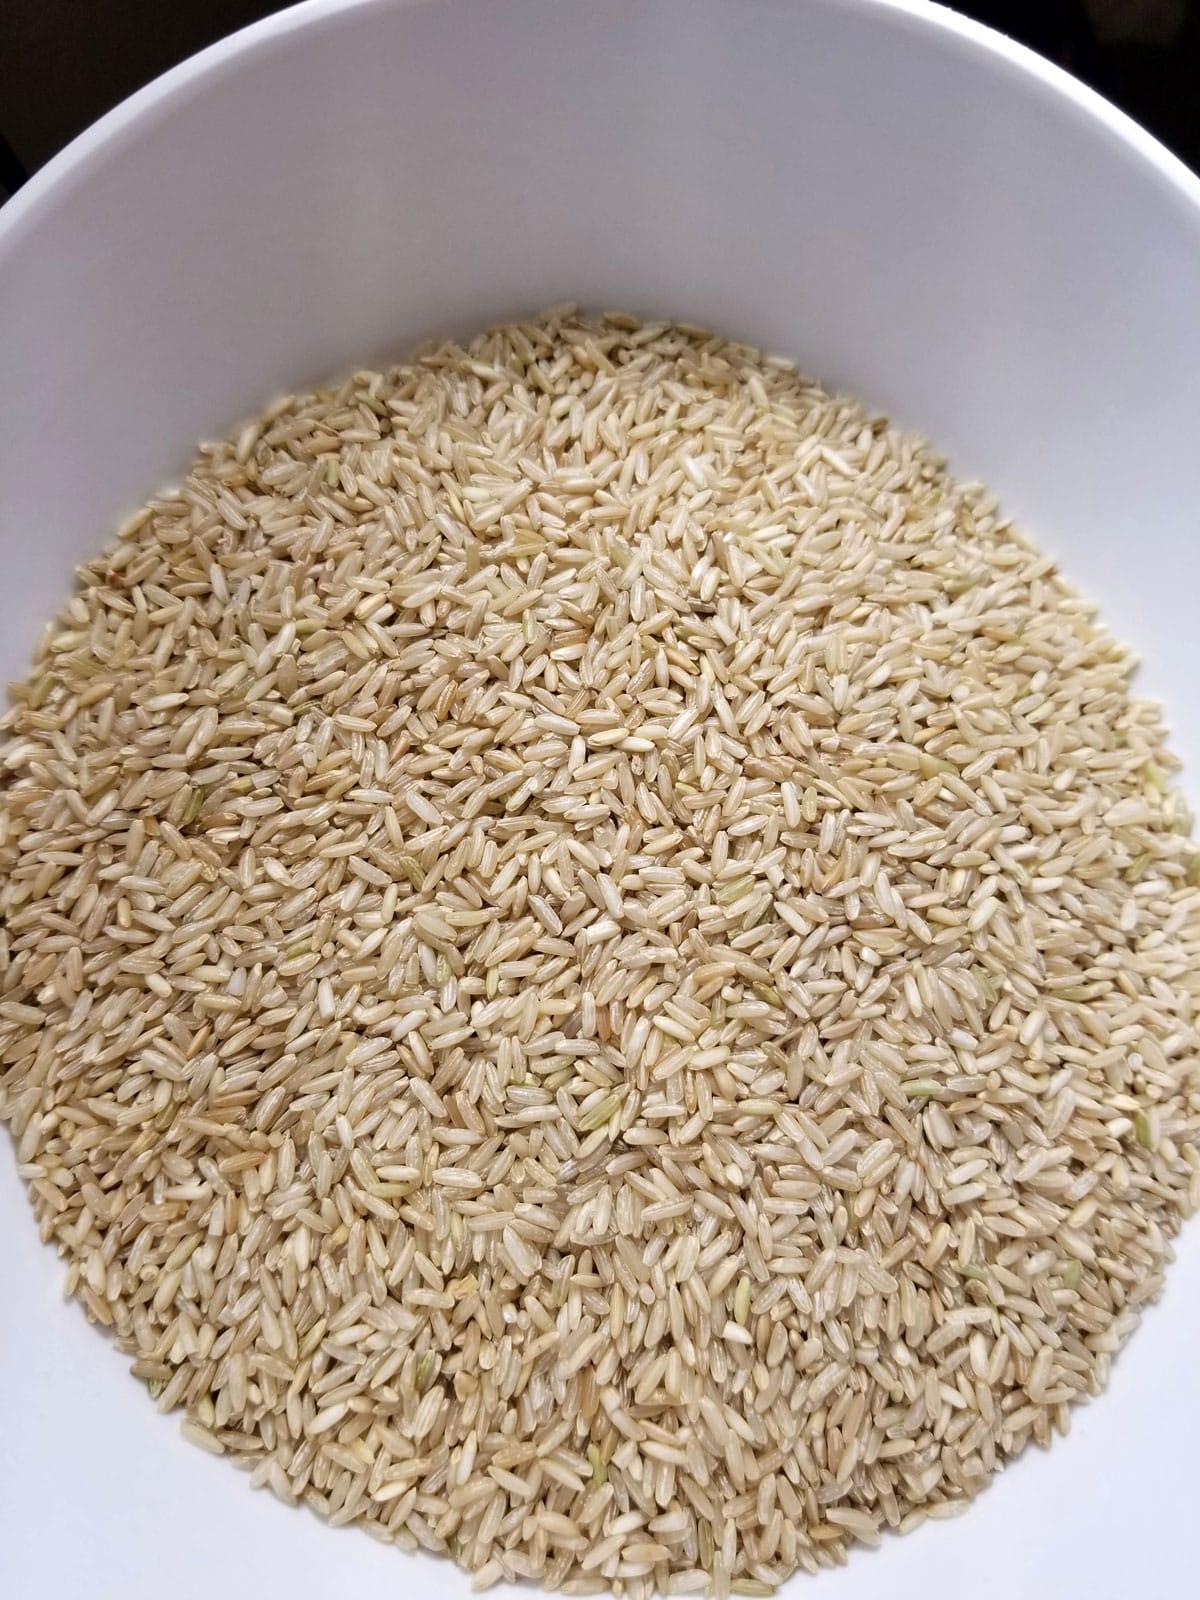 sona masoori rice brown